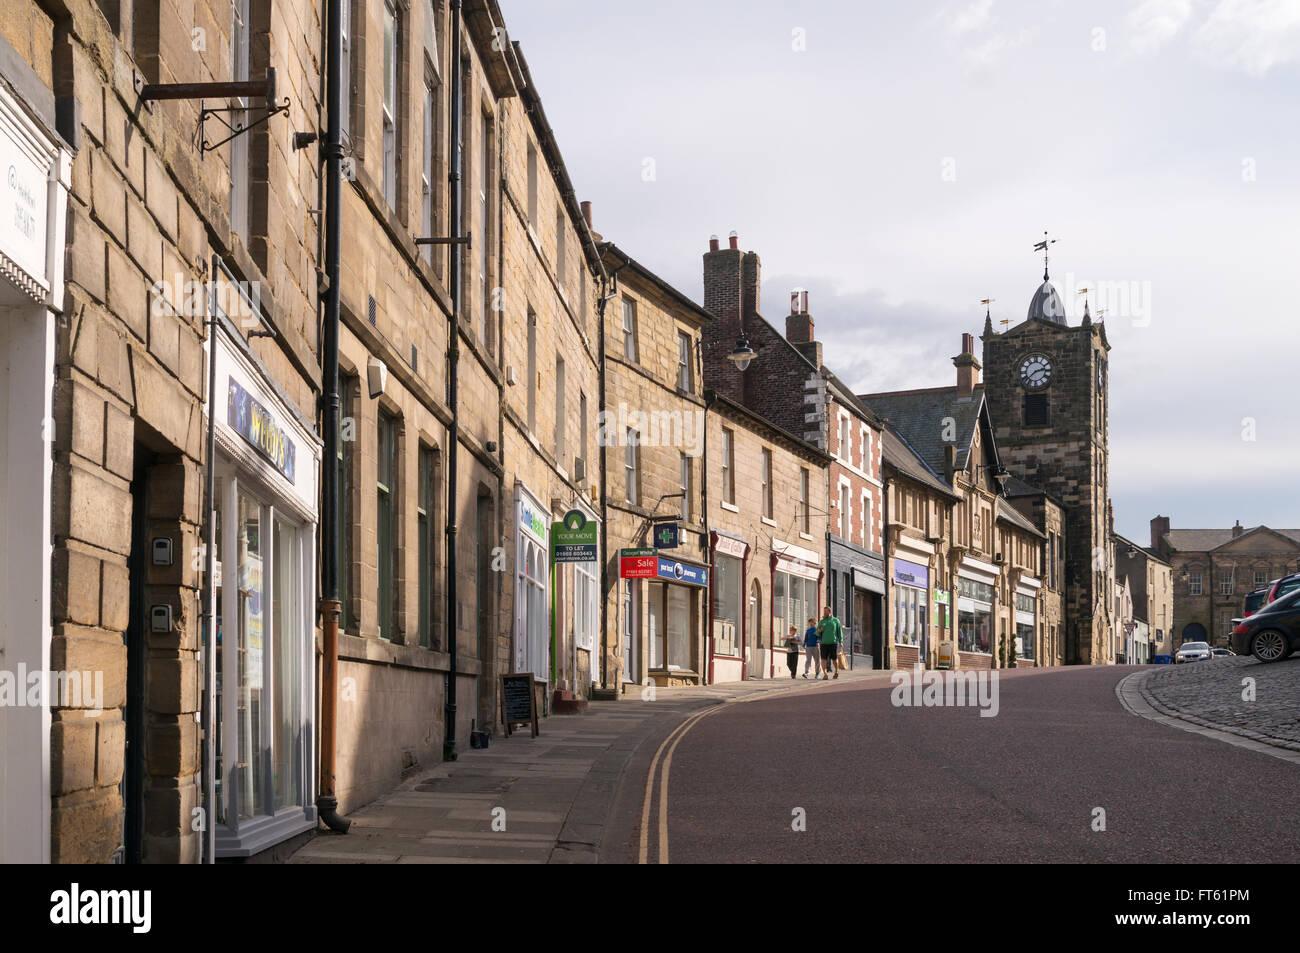 Stone buildings in Fenkle Street, Alnwick, Northumberland, England, UK - Stock Image